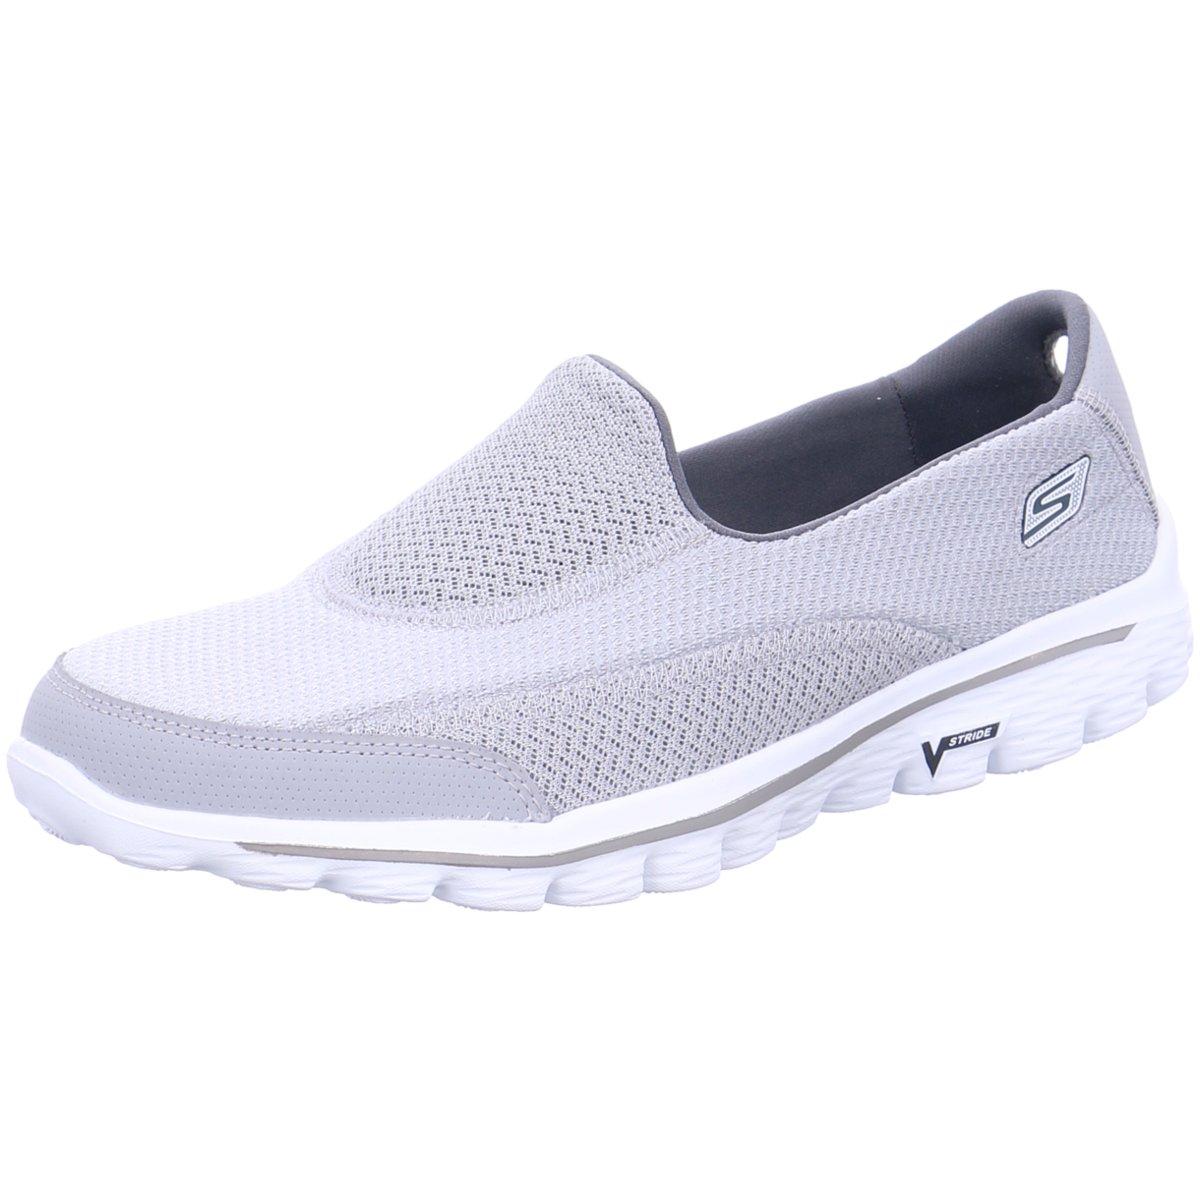 skechers damen slipper slipper halbschuh go walk 2 13590. Black Bedroom Furniture Sets. Home Design Ideas